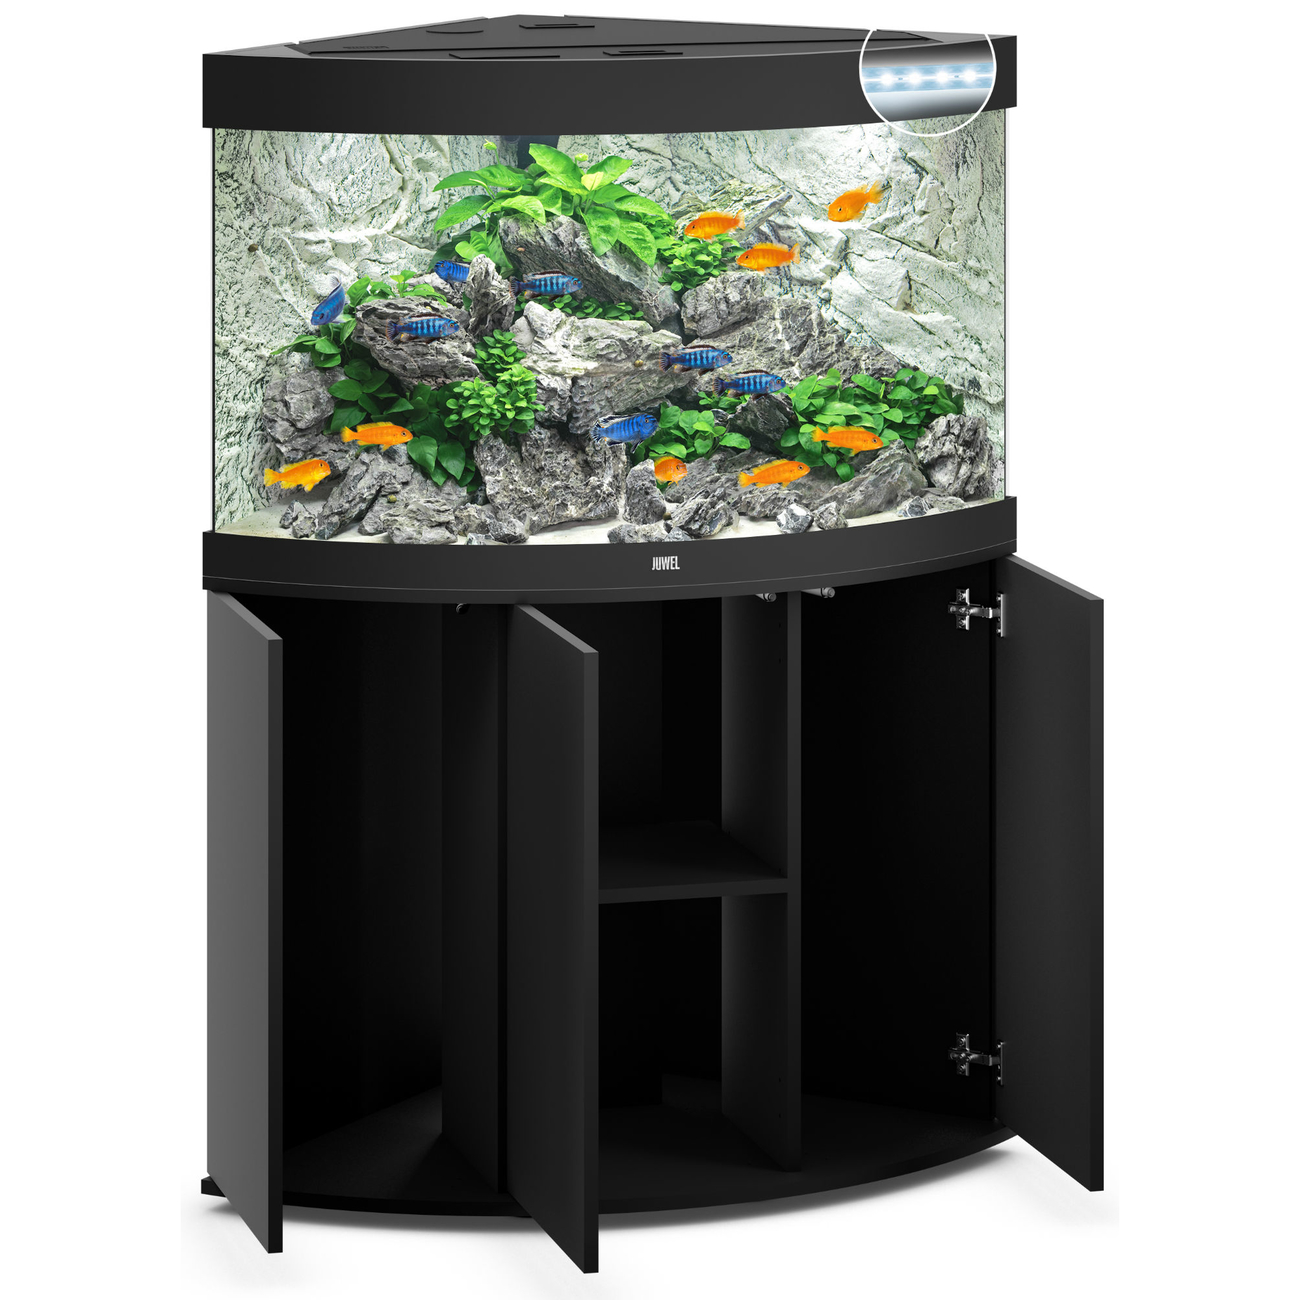 Juwel Trigon 190 LED Eck-Aquarium mit Unterschrank Bild 2